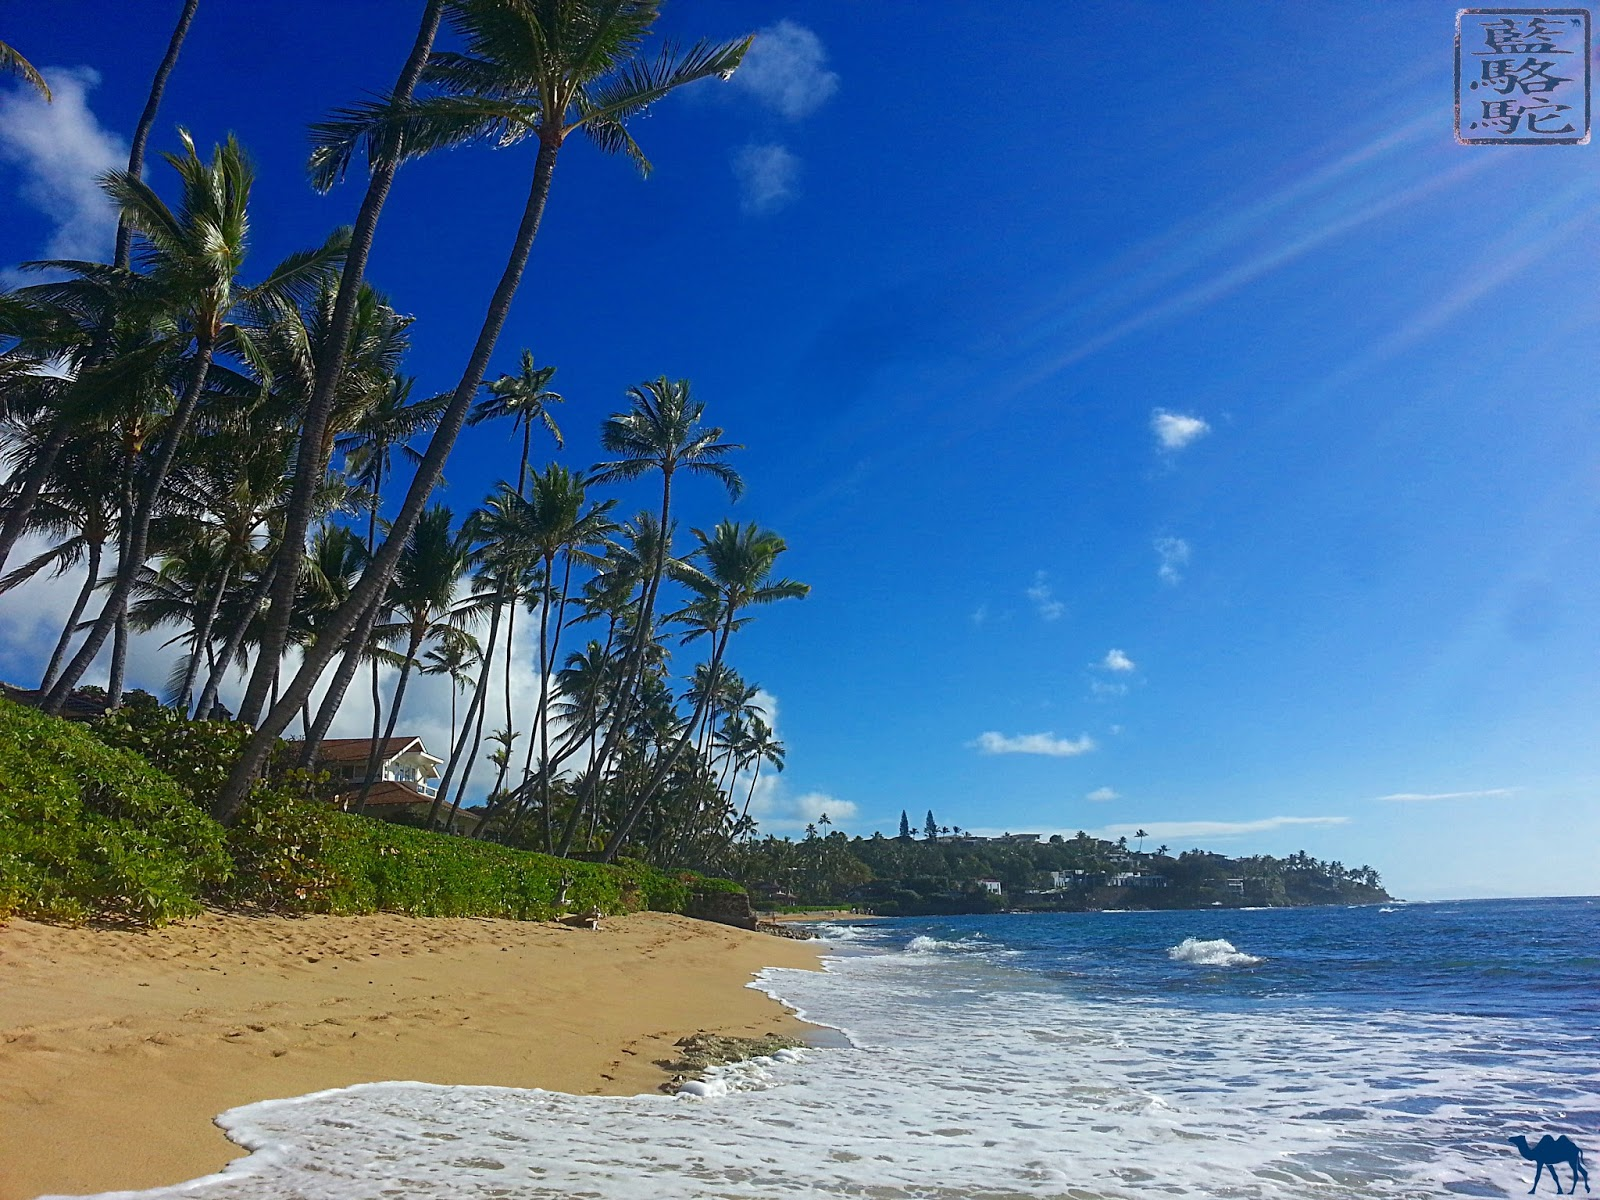 Le Chameau Bleu - Blog Voyage Hawaii - Instantanés d'Hawaii - Voyage à Hawaii